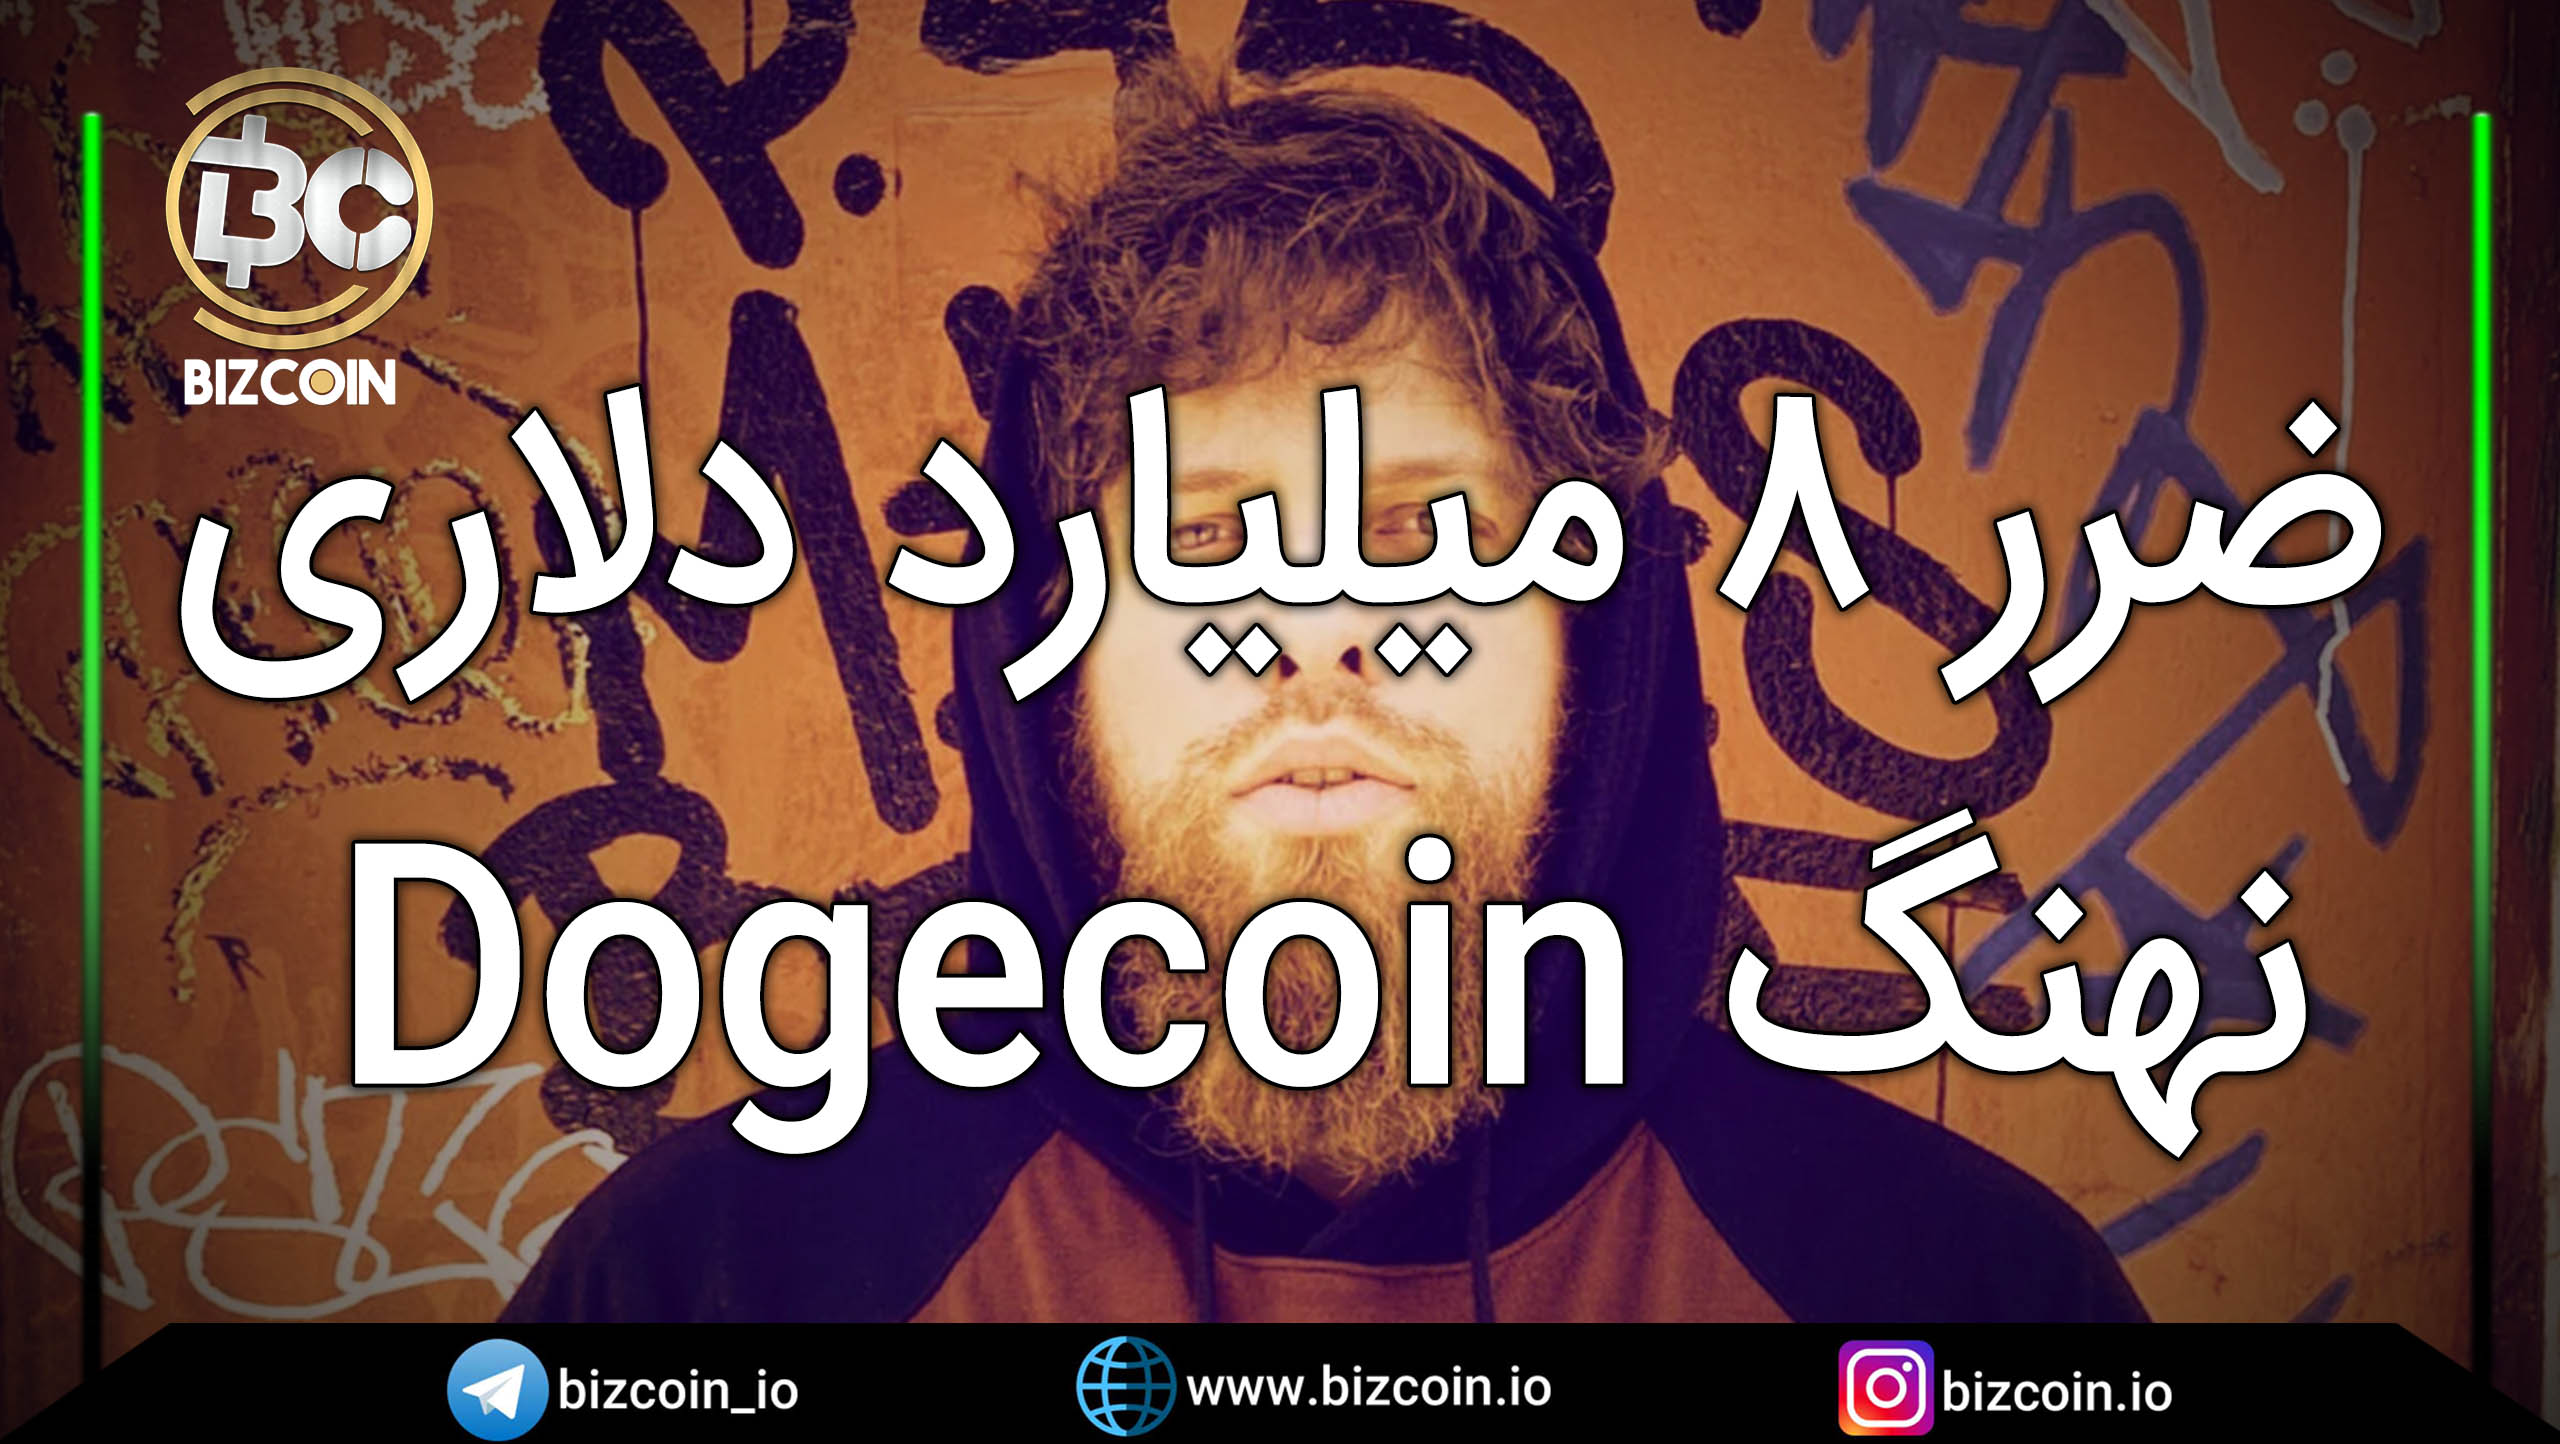 Dogecoin 8 billion loss ضرر ۸ میلیارد دلاری نهنگ Dogecoin